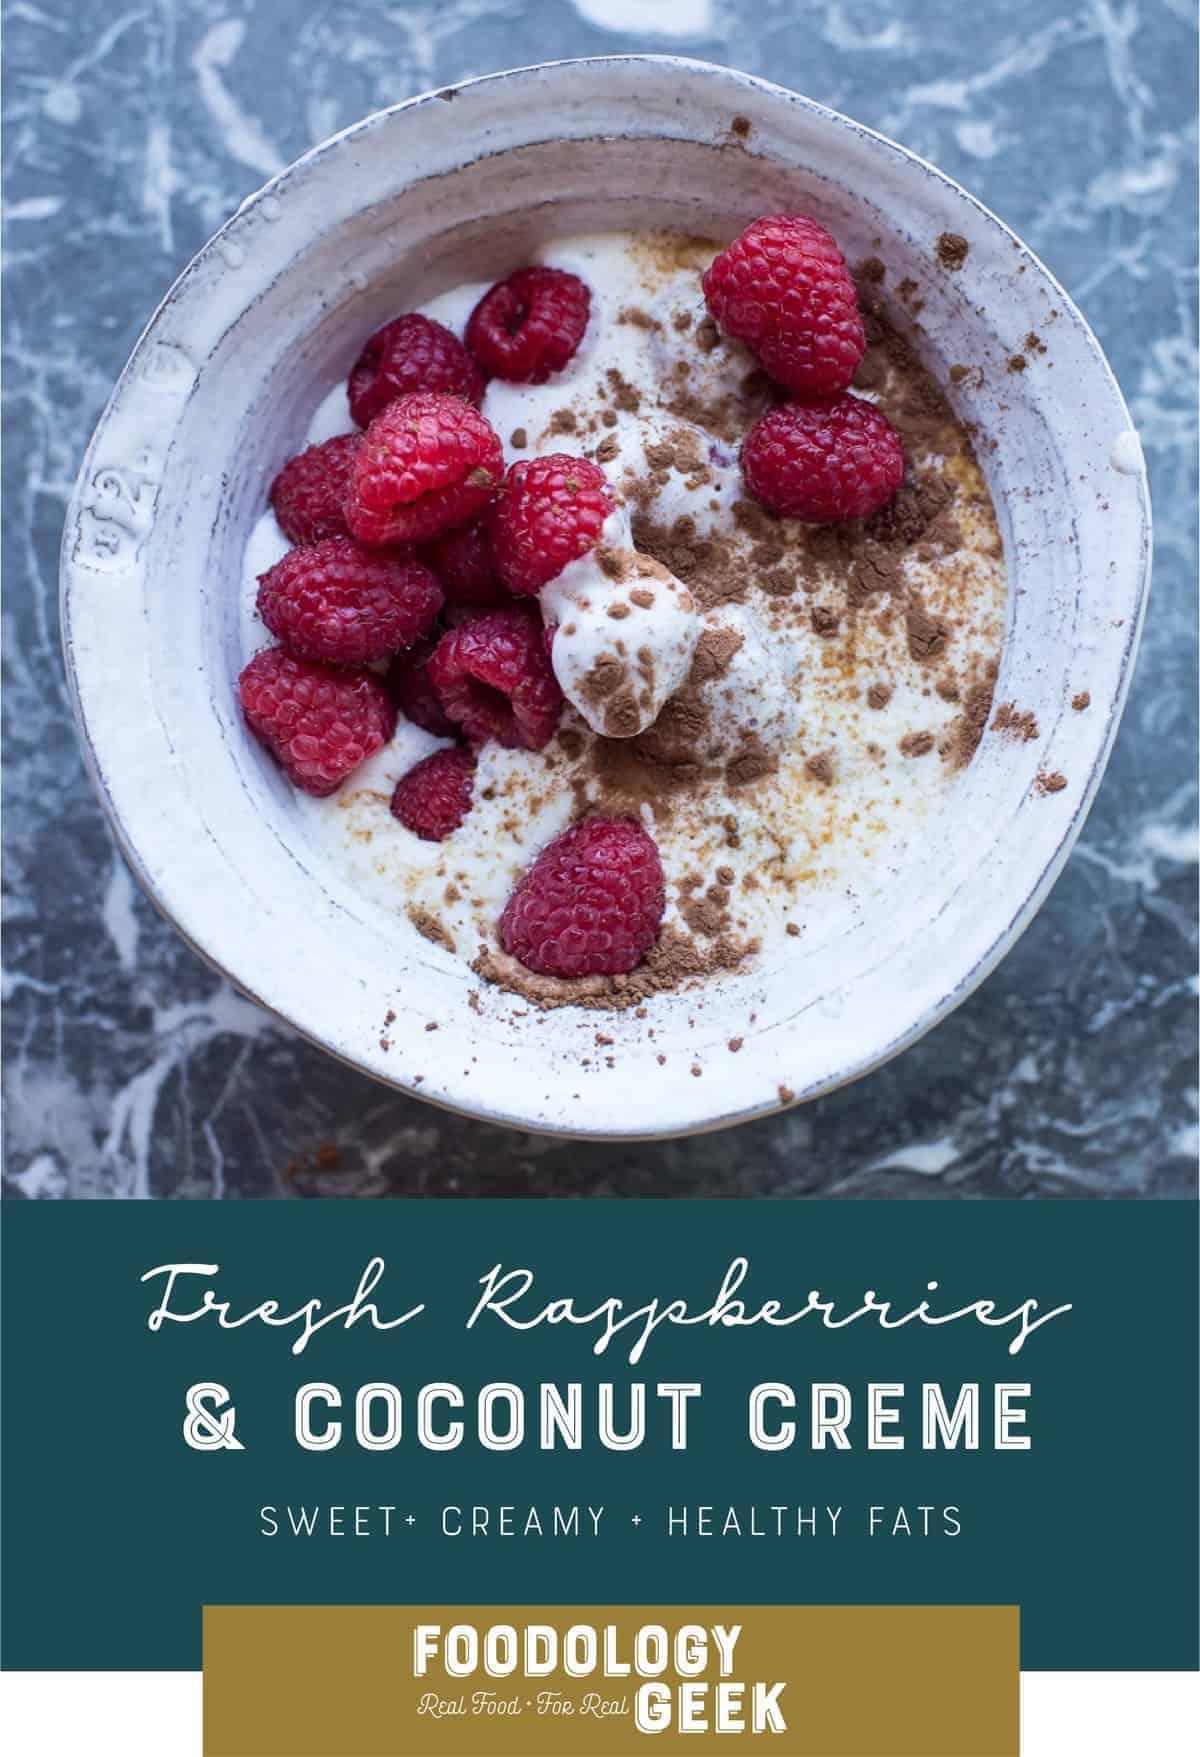 Fresh raspberries and coconut creme. pinterest image by foodology geek